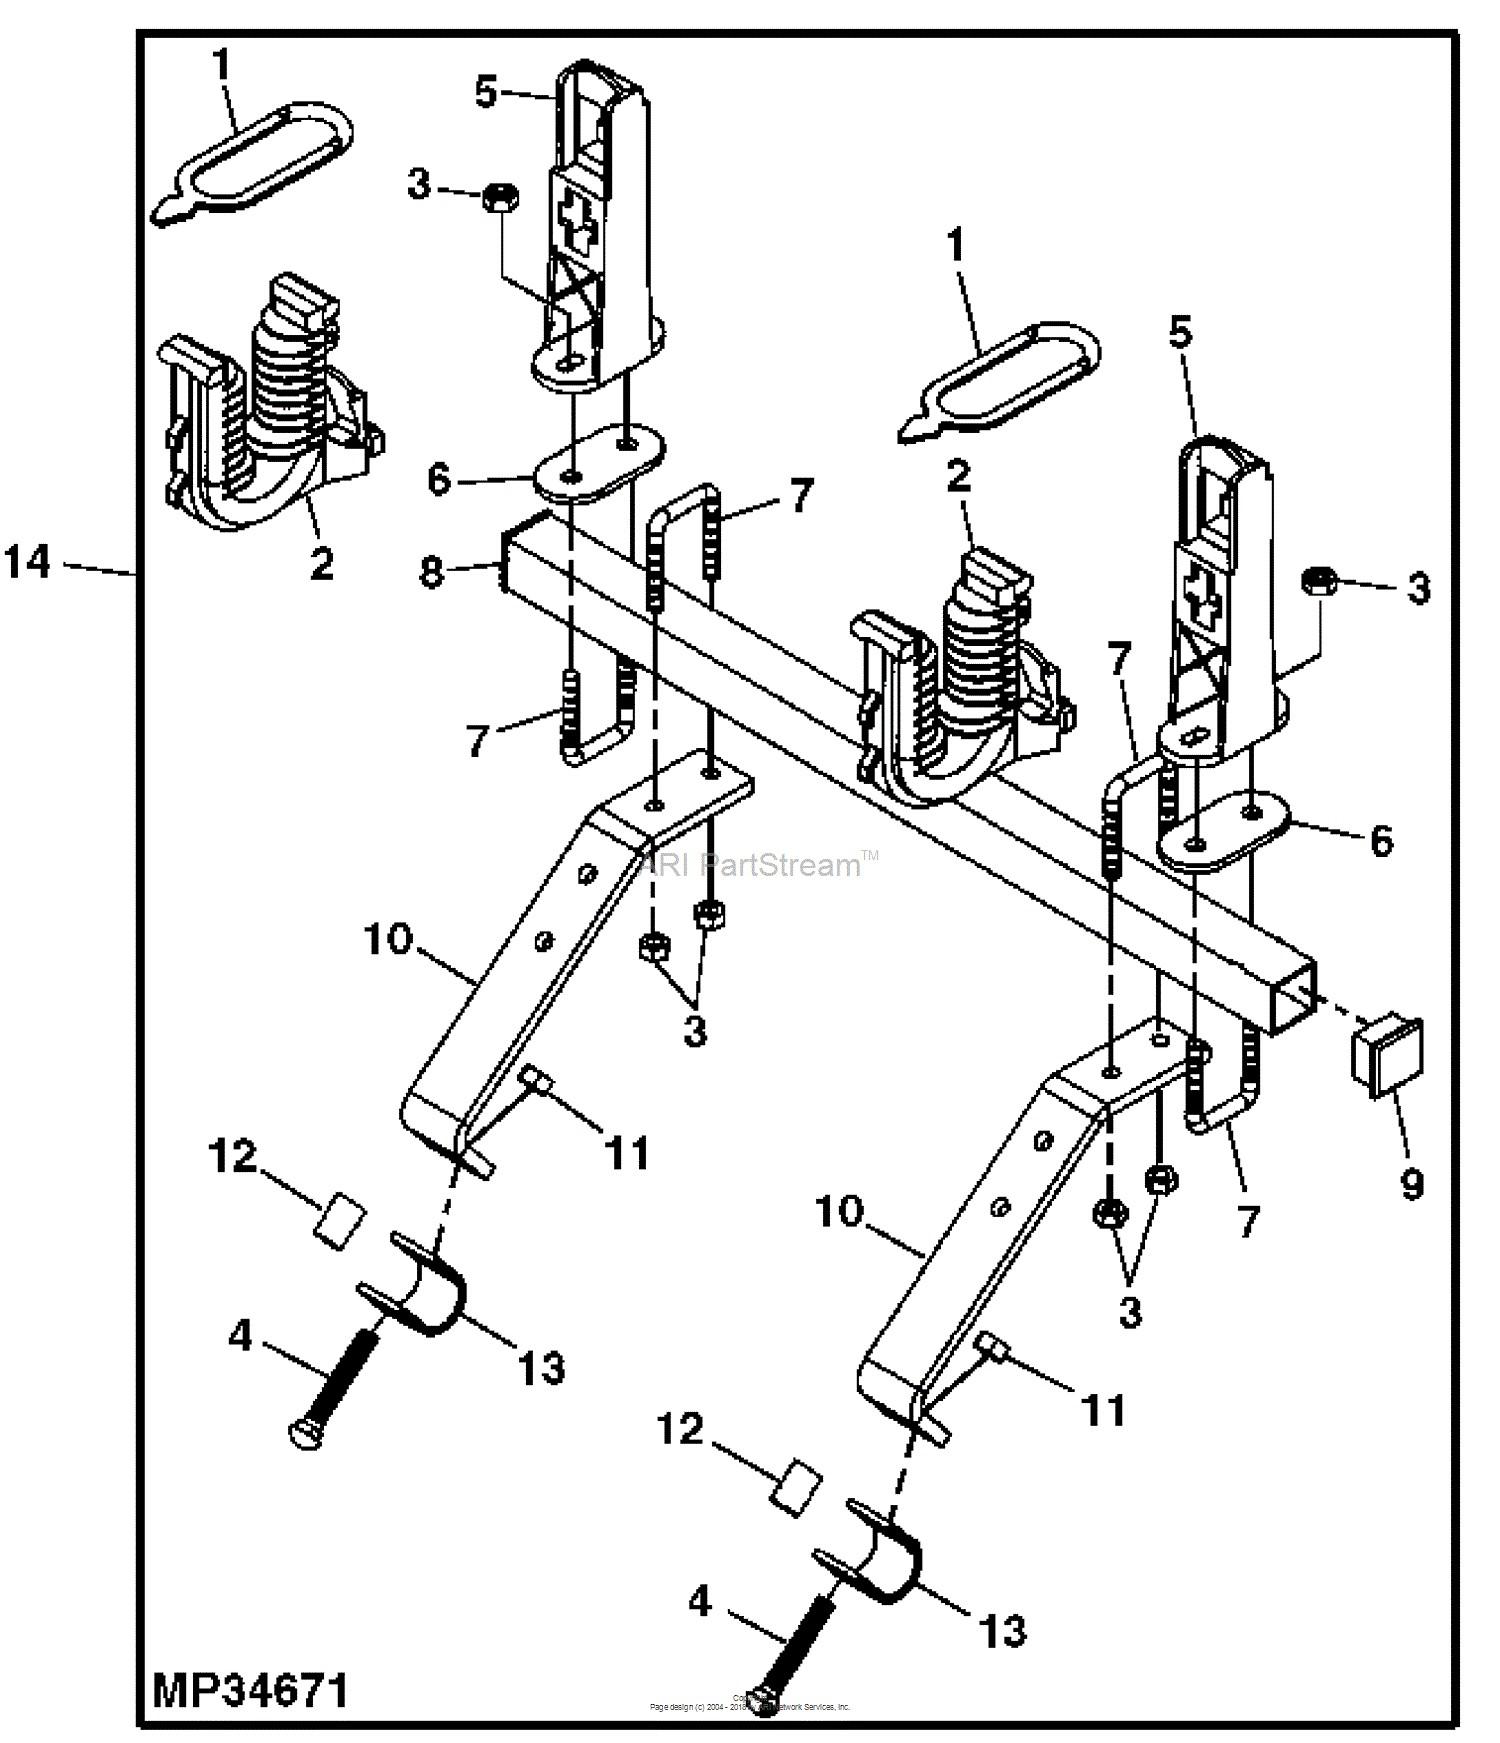 John Deere 2 Cylinder Engine Diagram John Deere Parts Diagrams John Deere Trail Buck 500 Utility atv Of John Deere 2 Cylinder Engine Diagram